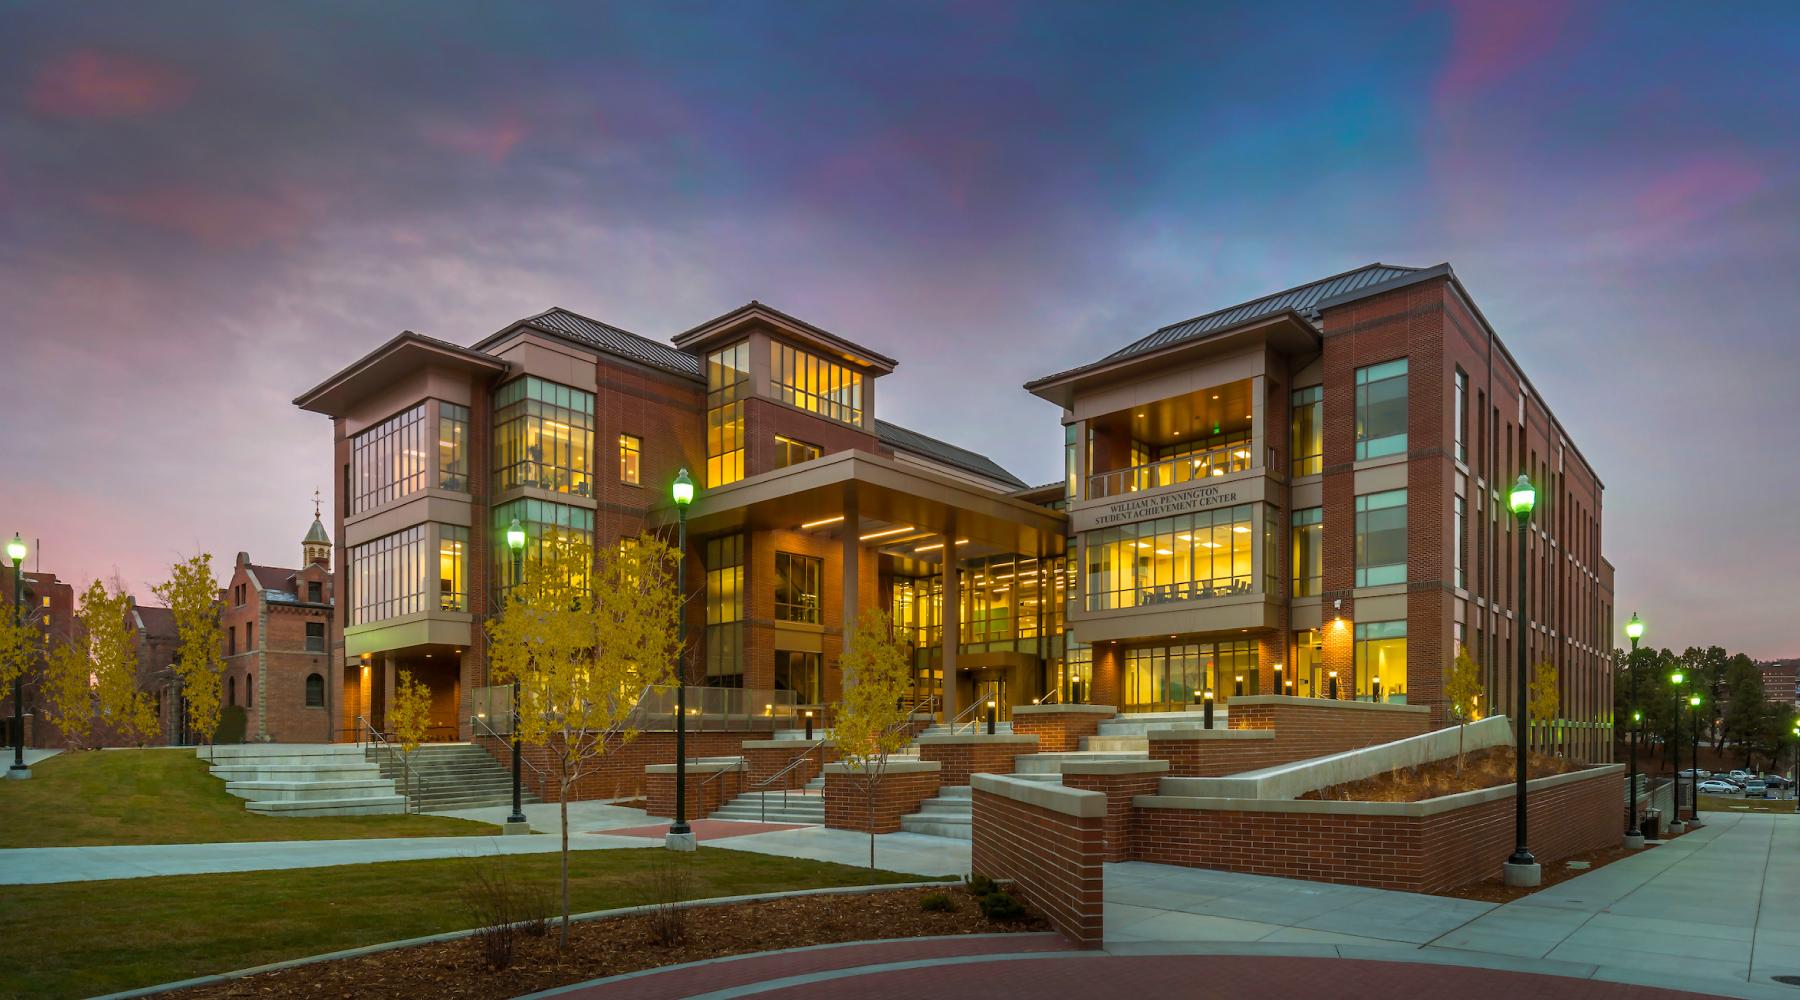 UNR Pennington Health Science Building